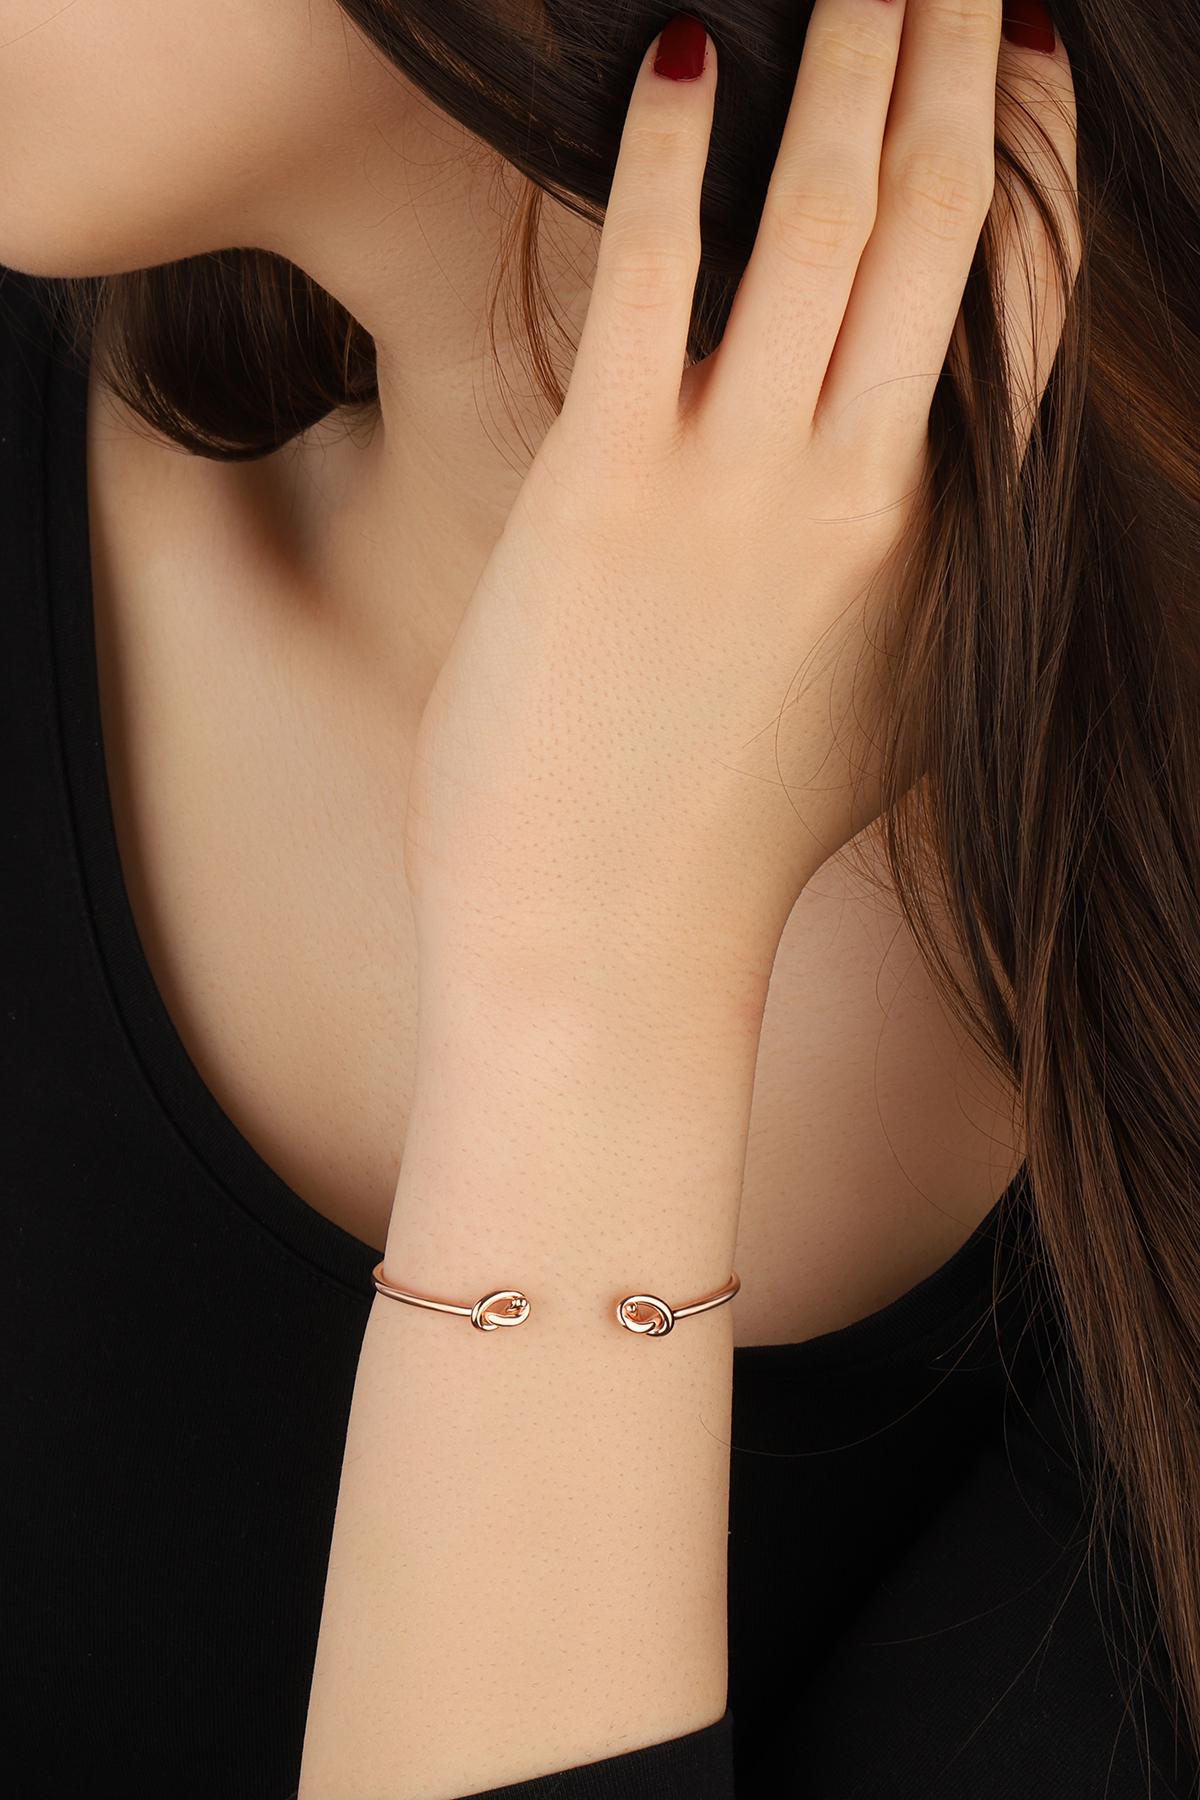 Minimalist Bracelet Stacking Bracelet,Curved Bar Bracelet Bar /& Chain Bracelet Sterling Silver Bracelet,Minimalist Jewelry,Modern Jewelry